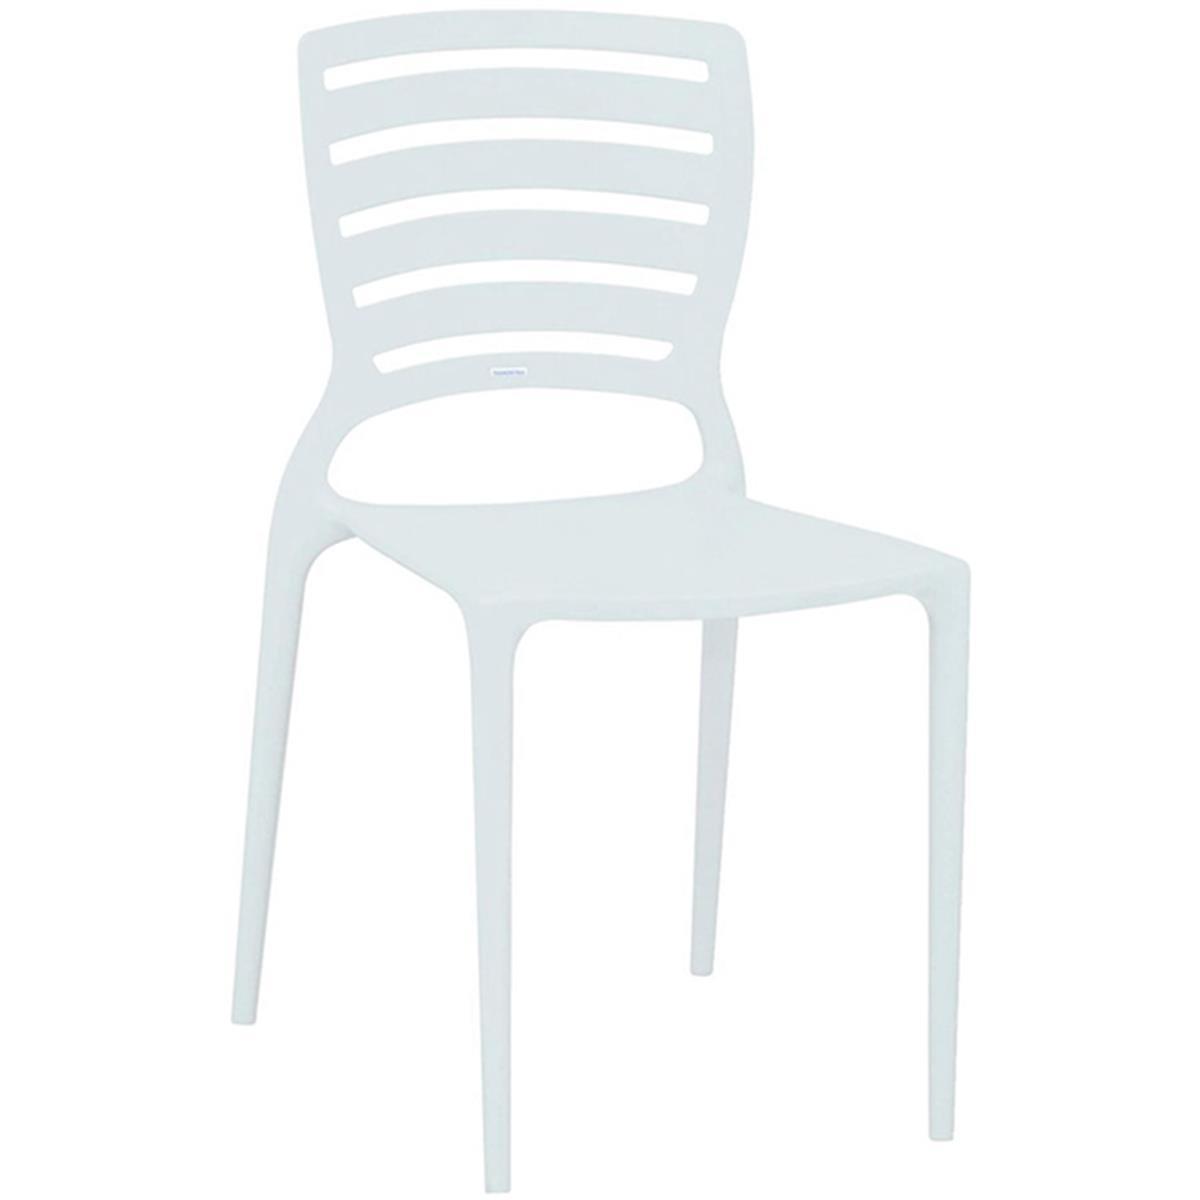 Cadeira Sofia Branca Resistente Monobloco Horizontal Tramontina